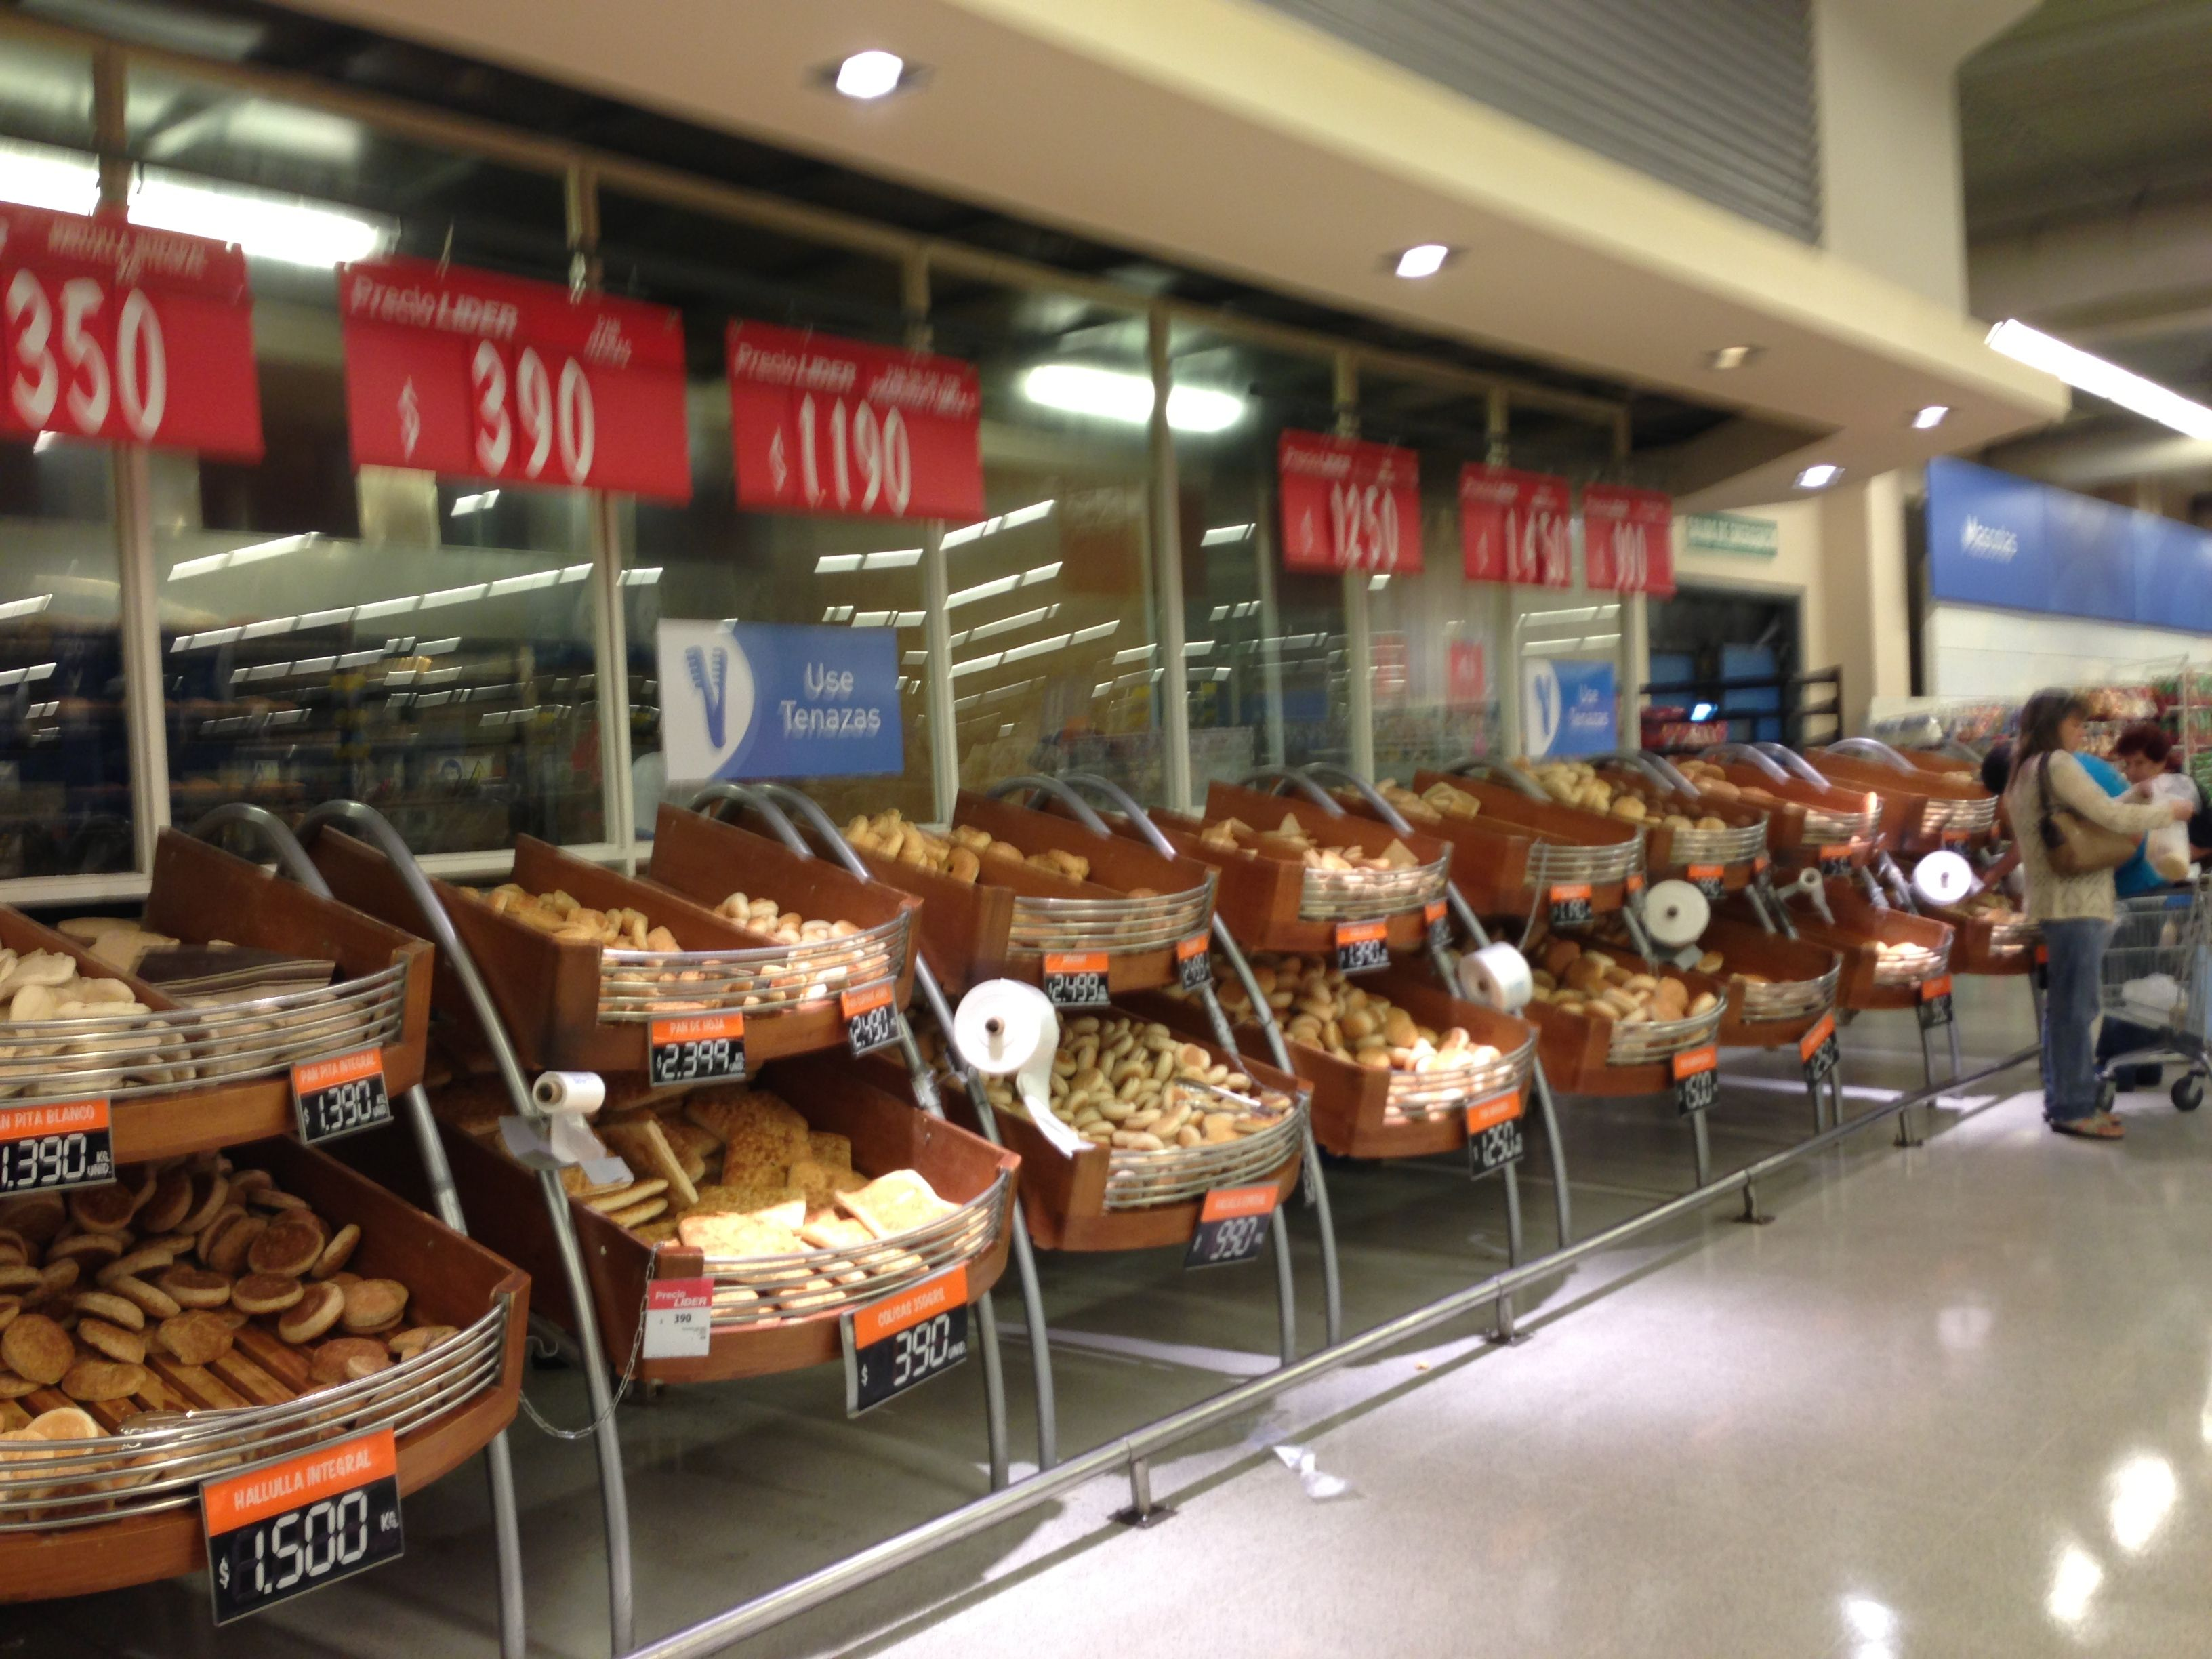 bb supermarket bakeries unclear - HD3264×2448